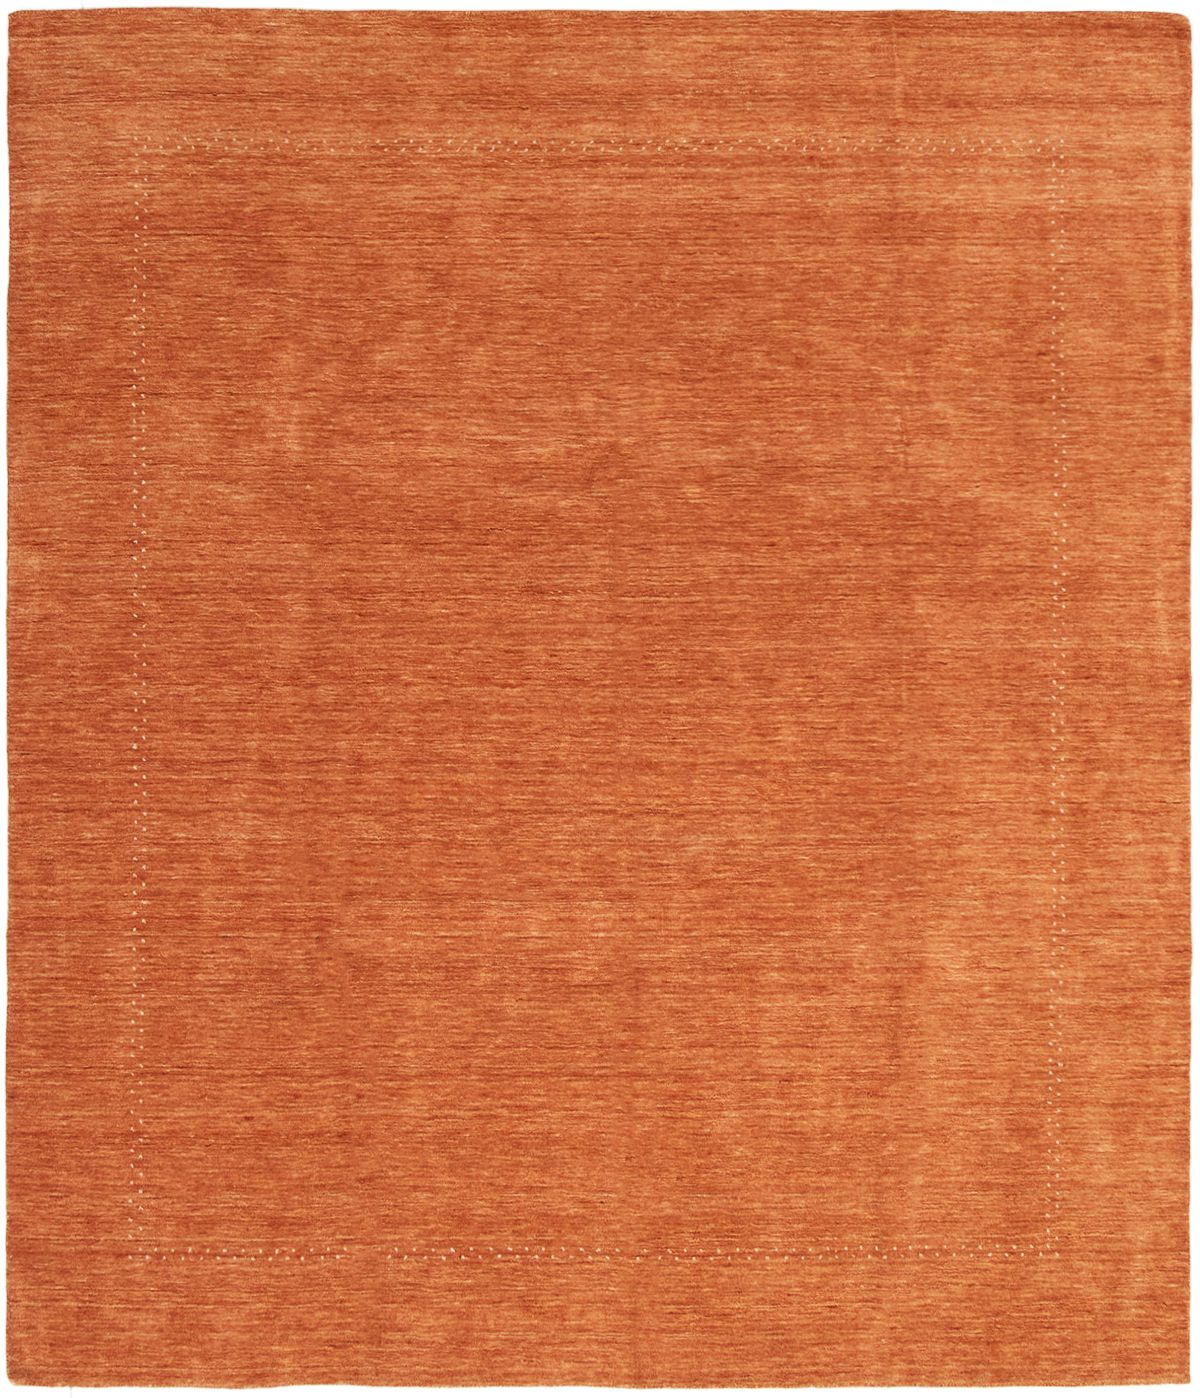 "Hand-knotted Kashkuli Gabbeh Orange Wool Rug 8'2"" x 9'6"" Size: 8'2"" x 9'6"""